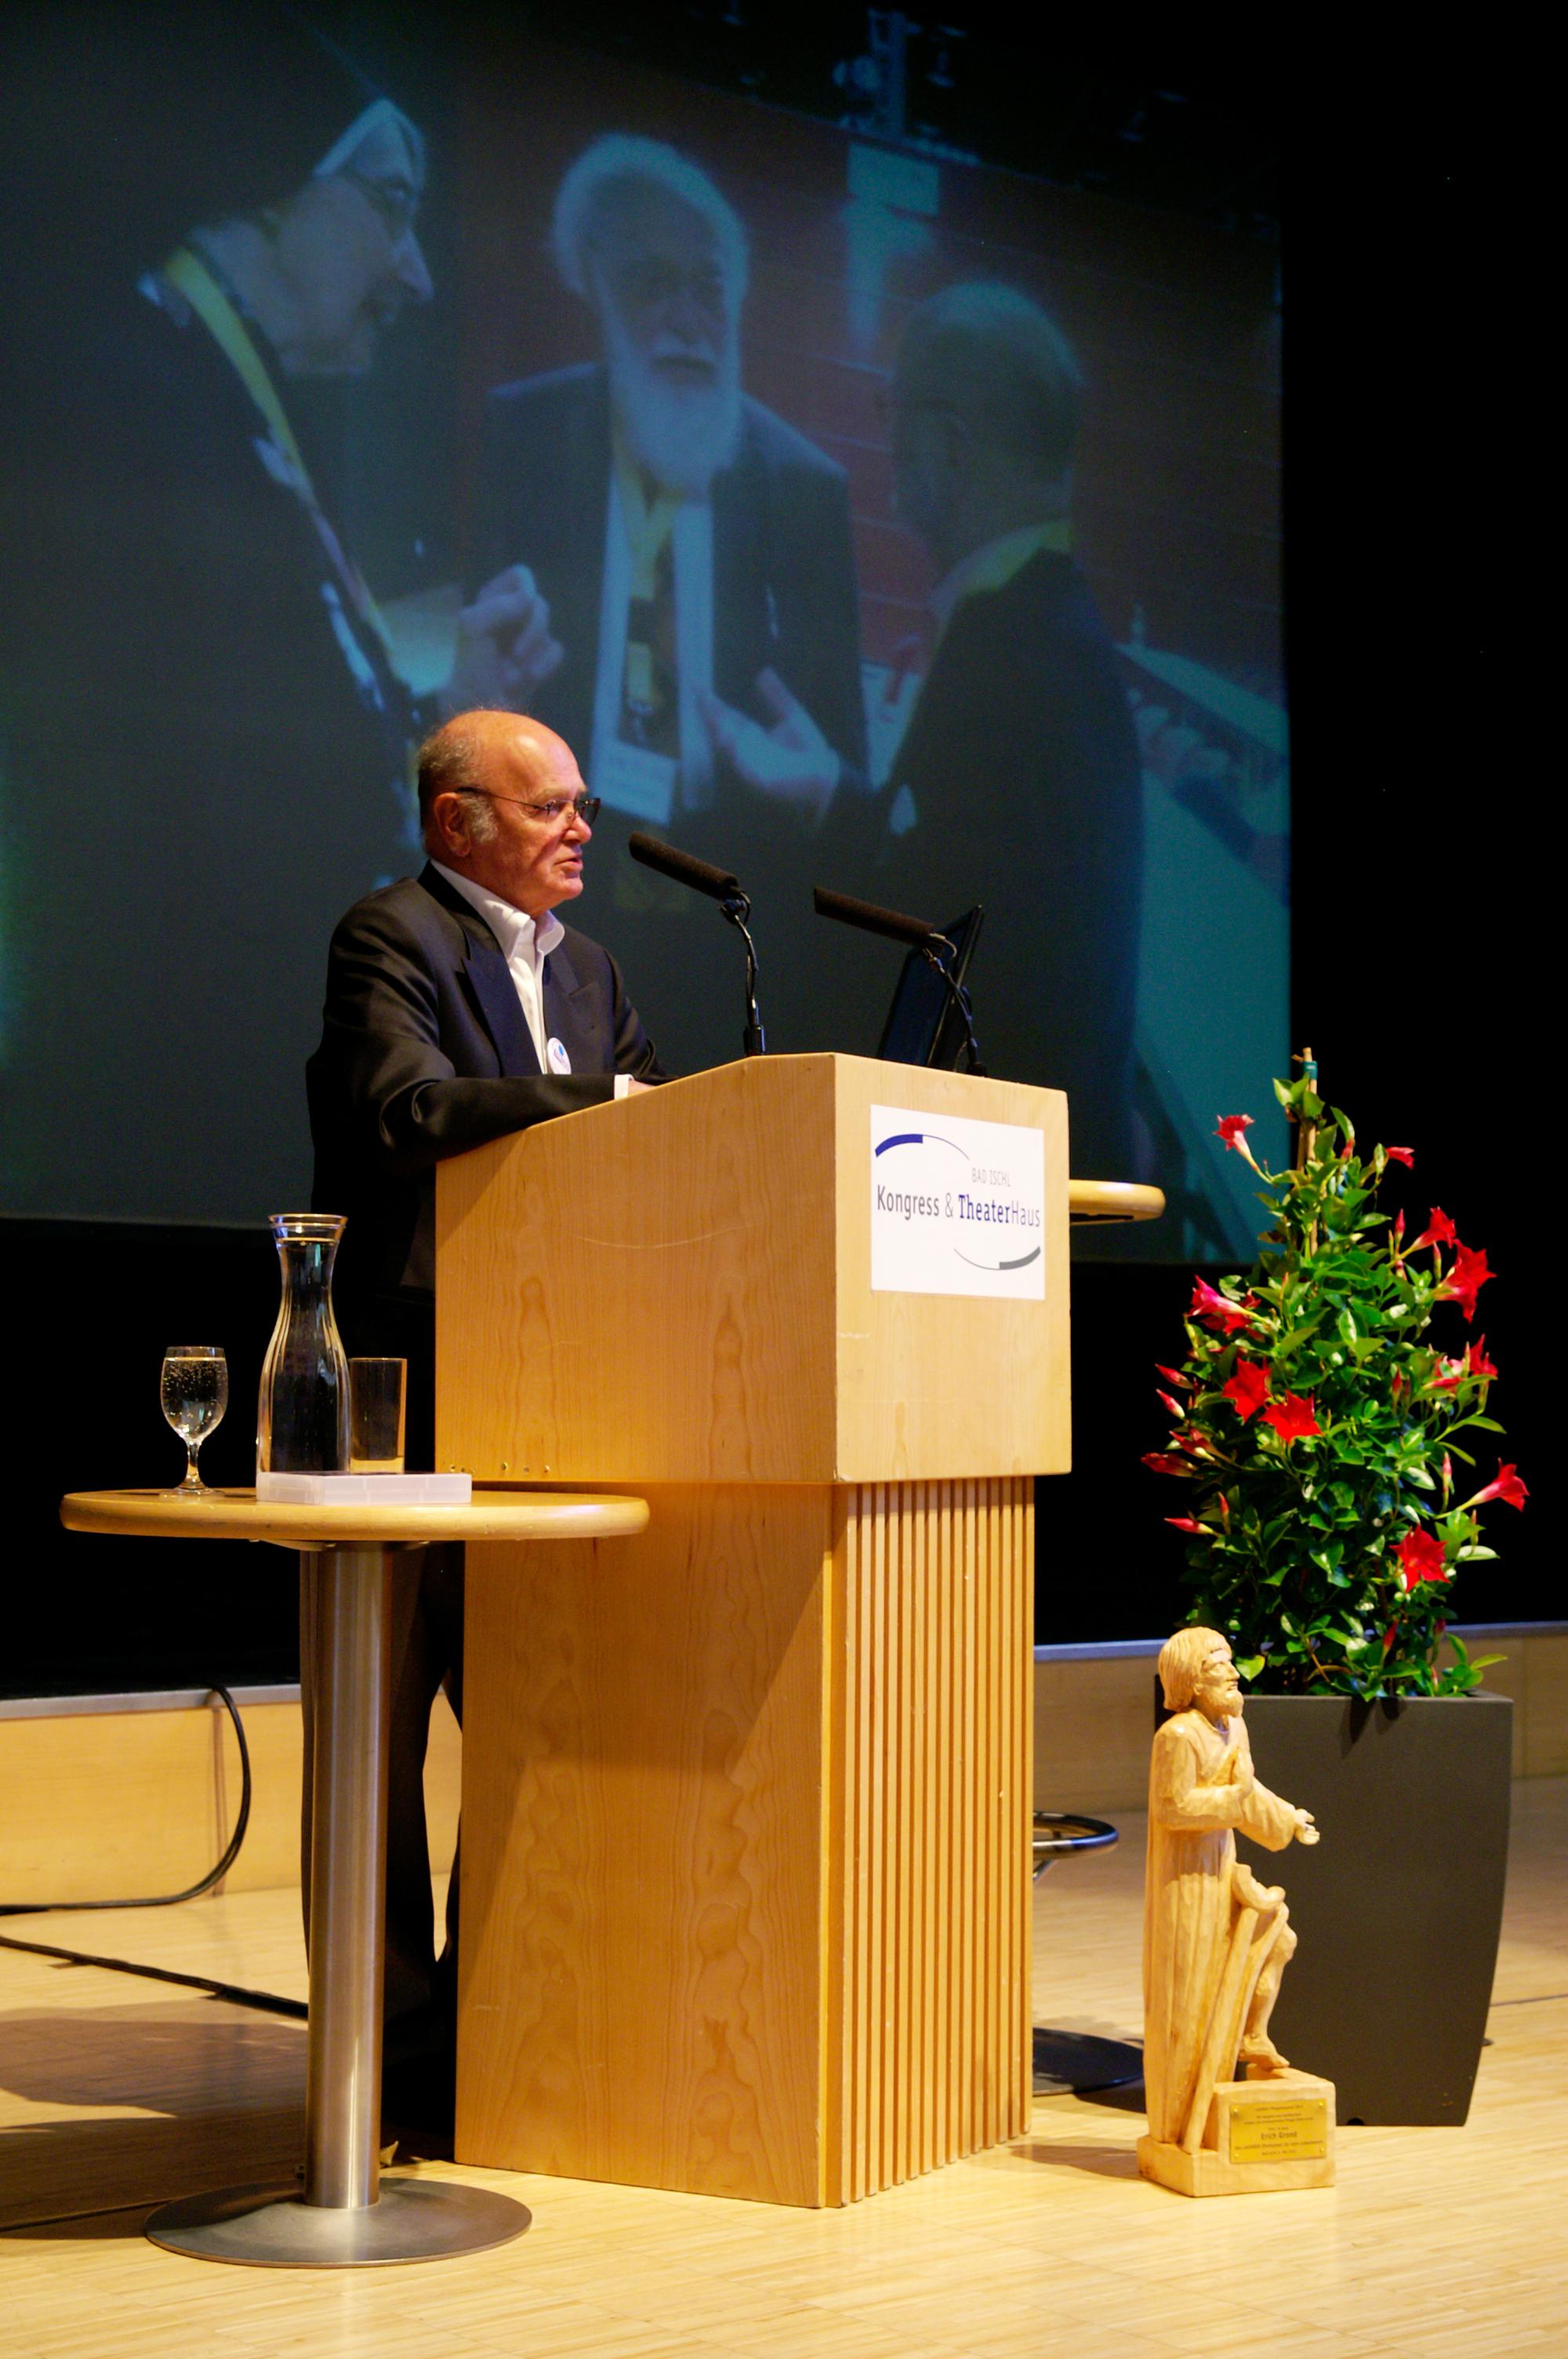 Prominenter Laudator: Prof. Erwin Böhm